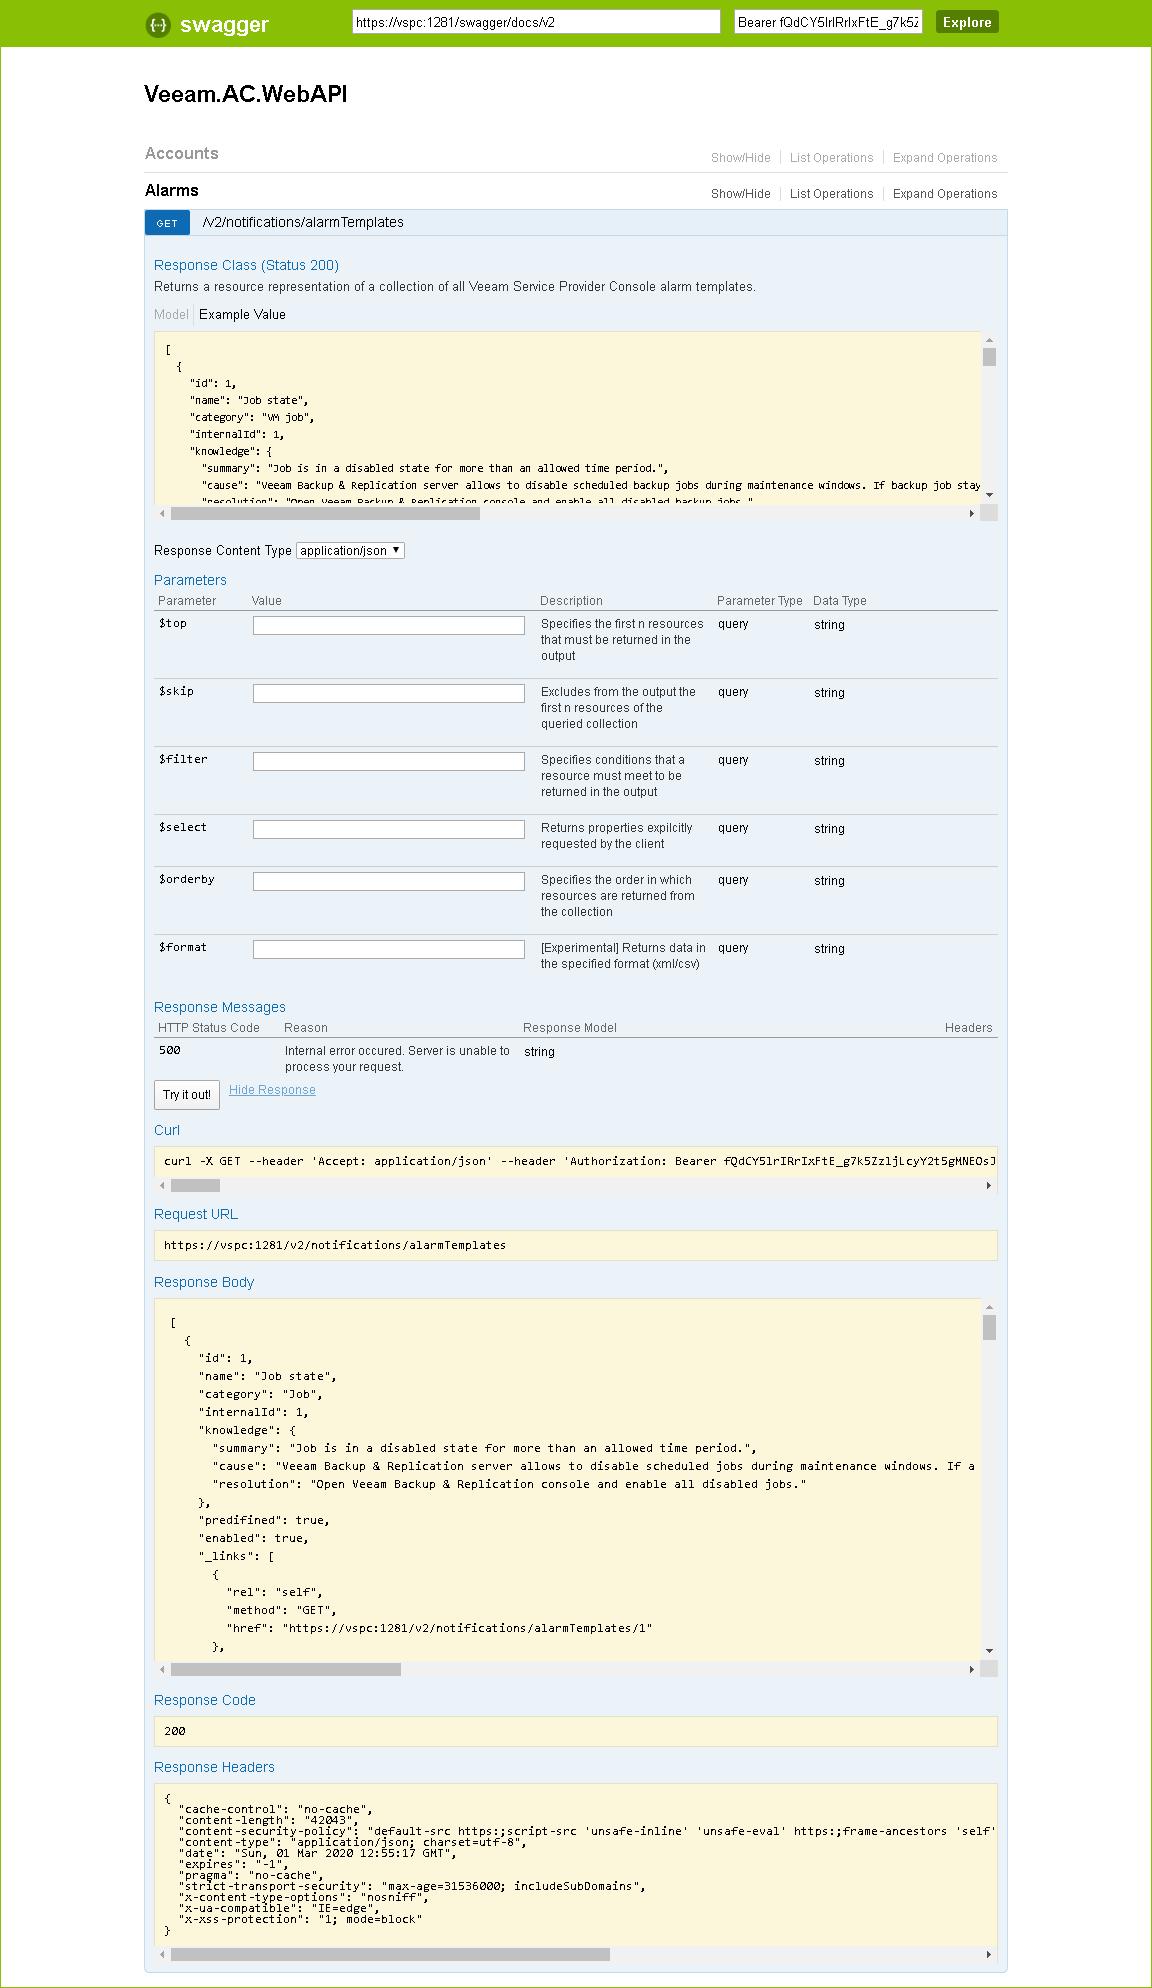 Sending Requests - RESTful API Reference